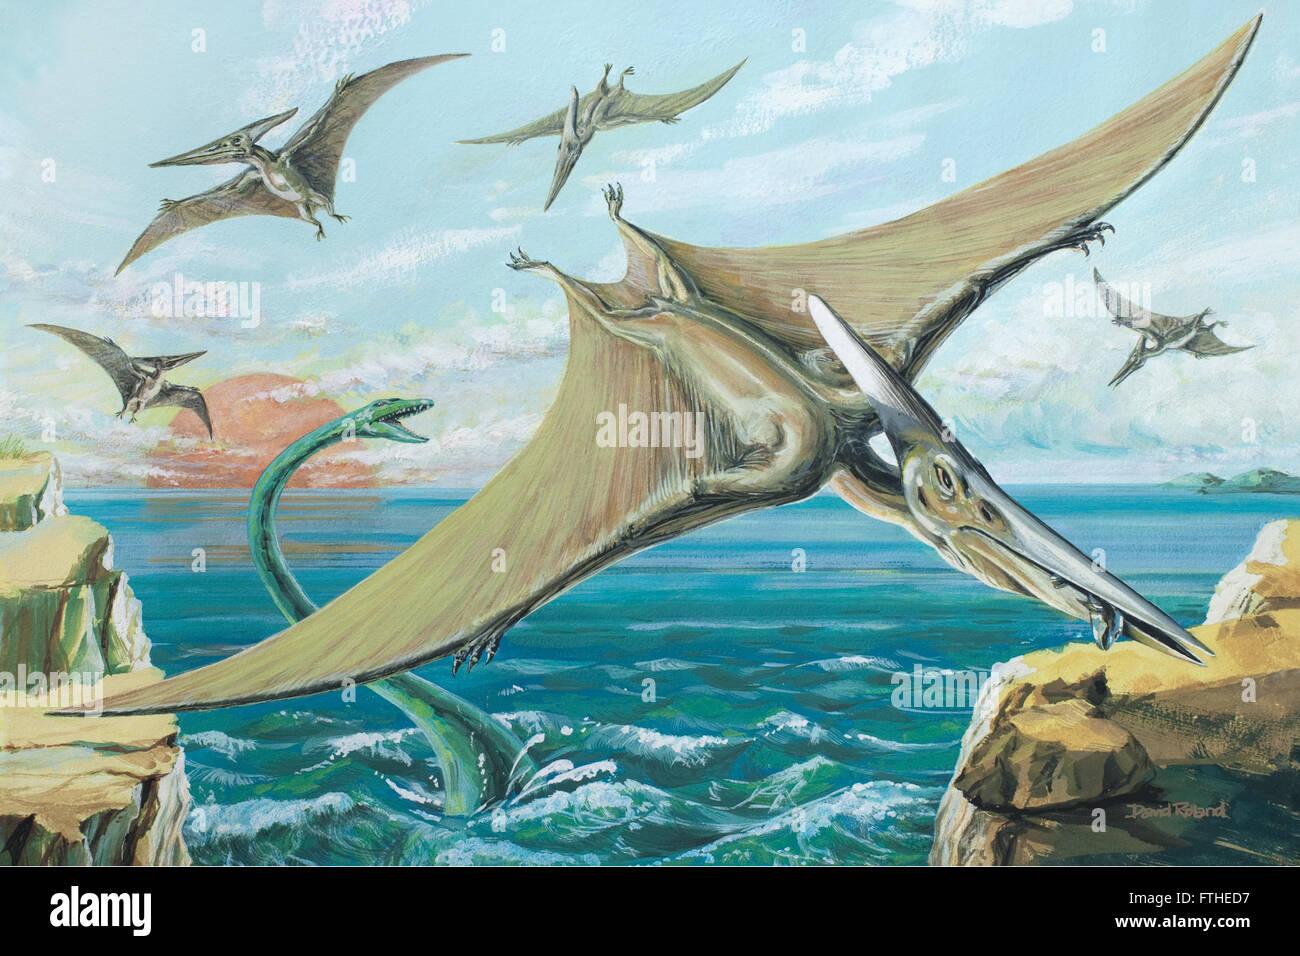 Pteranodon - Stock Image